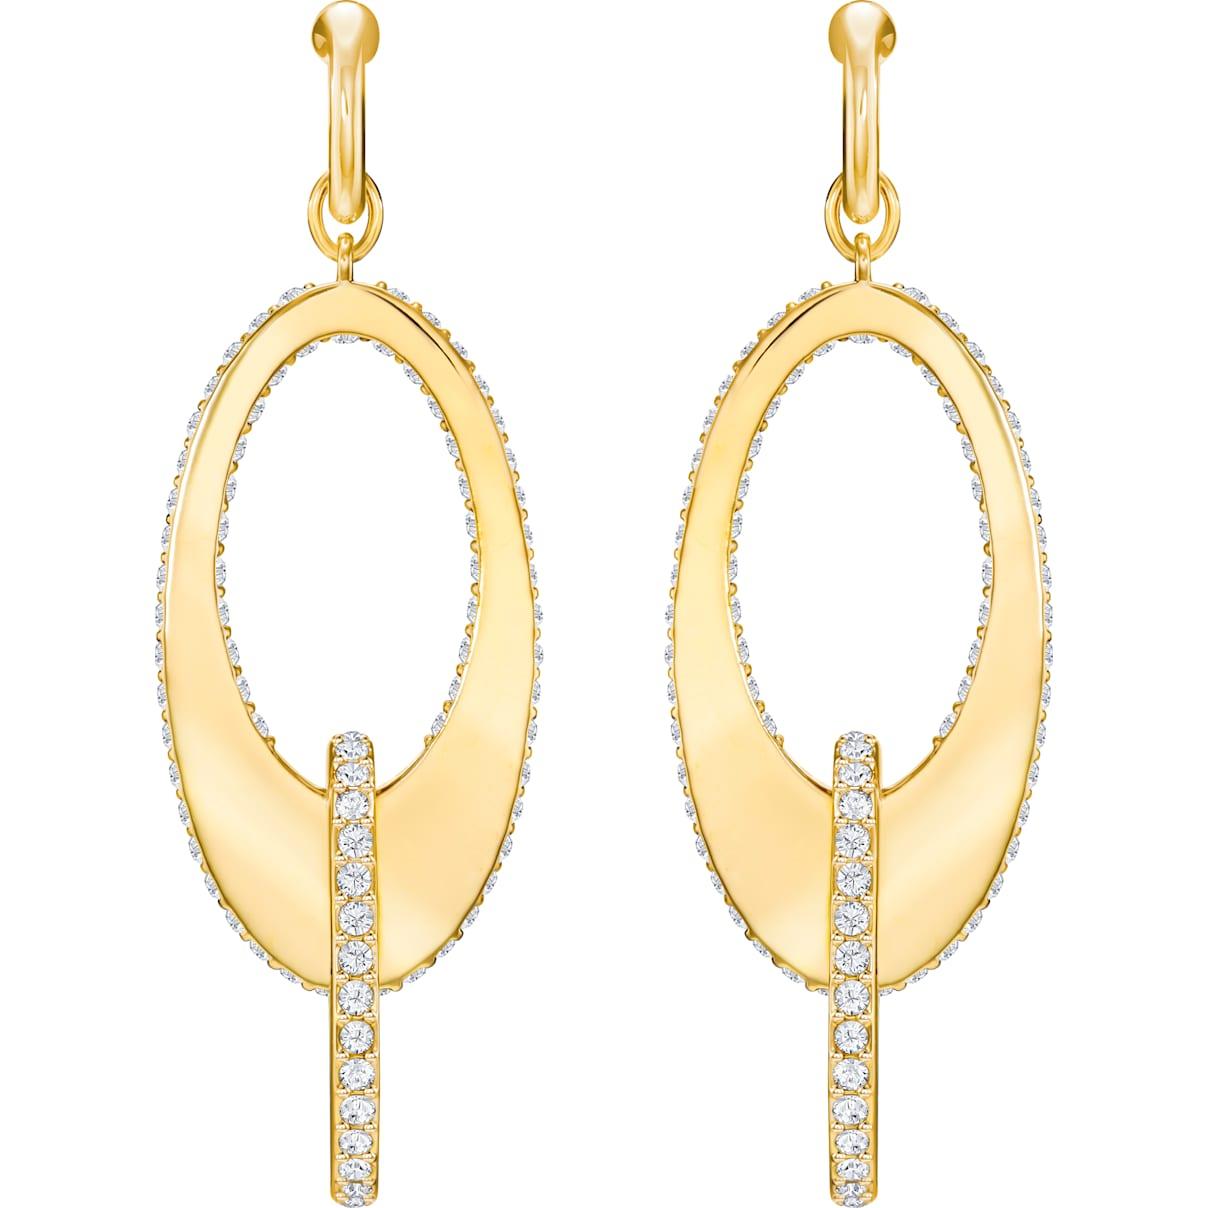 Swarovski Lakeside Hoop Pierced Earrings, White, Gold-tone plated